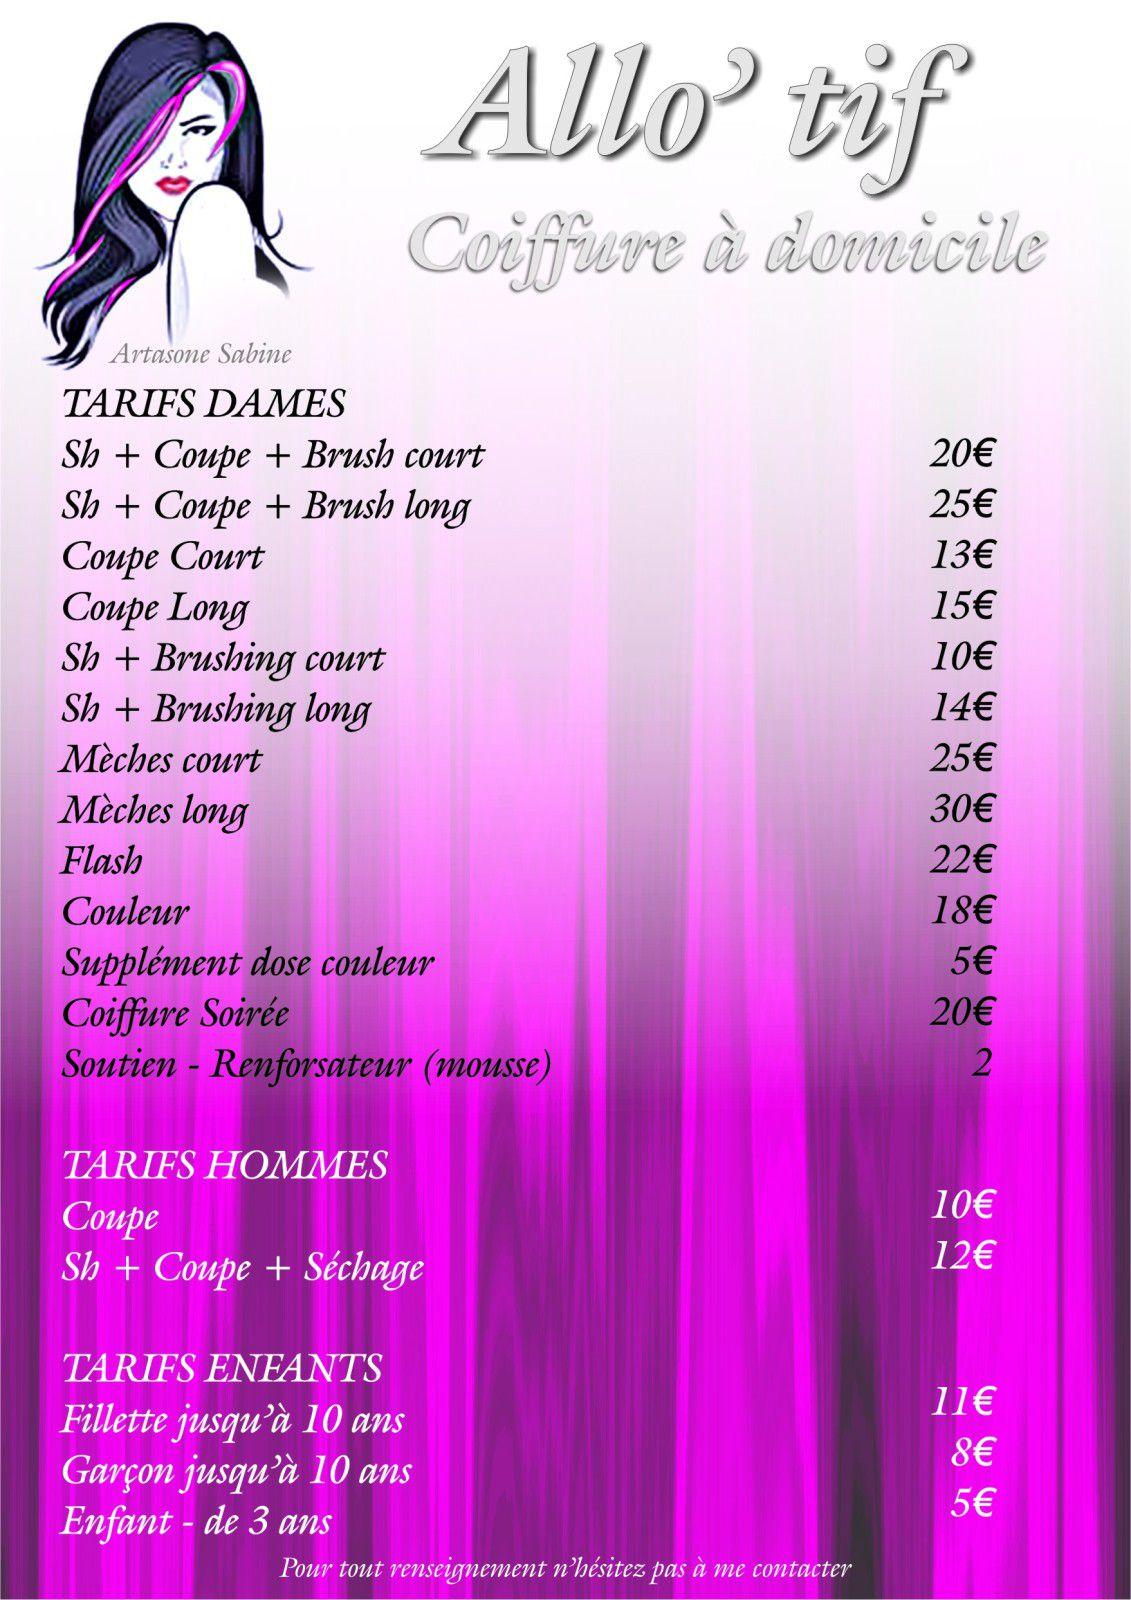 Coiffure A Domicile Frontignan Allo Tif Coiffure Domicile Herault 34